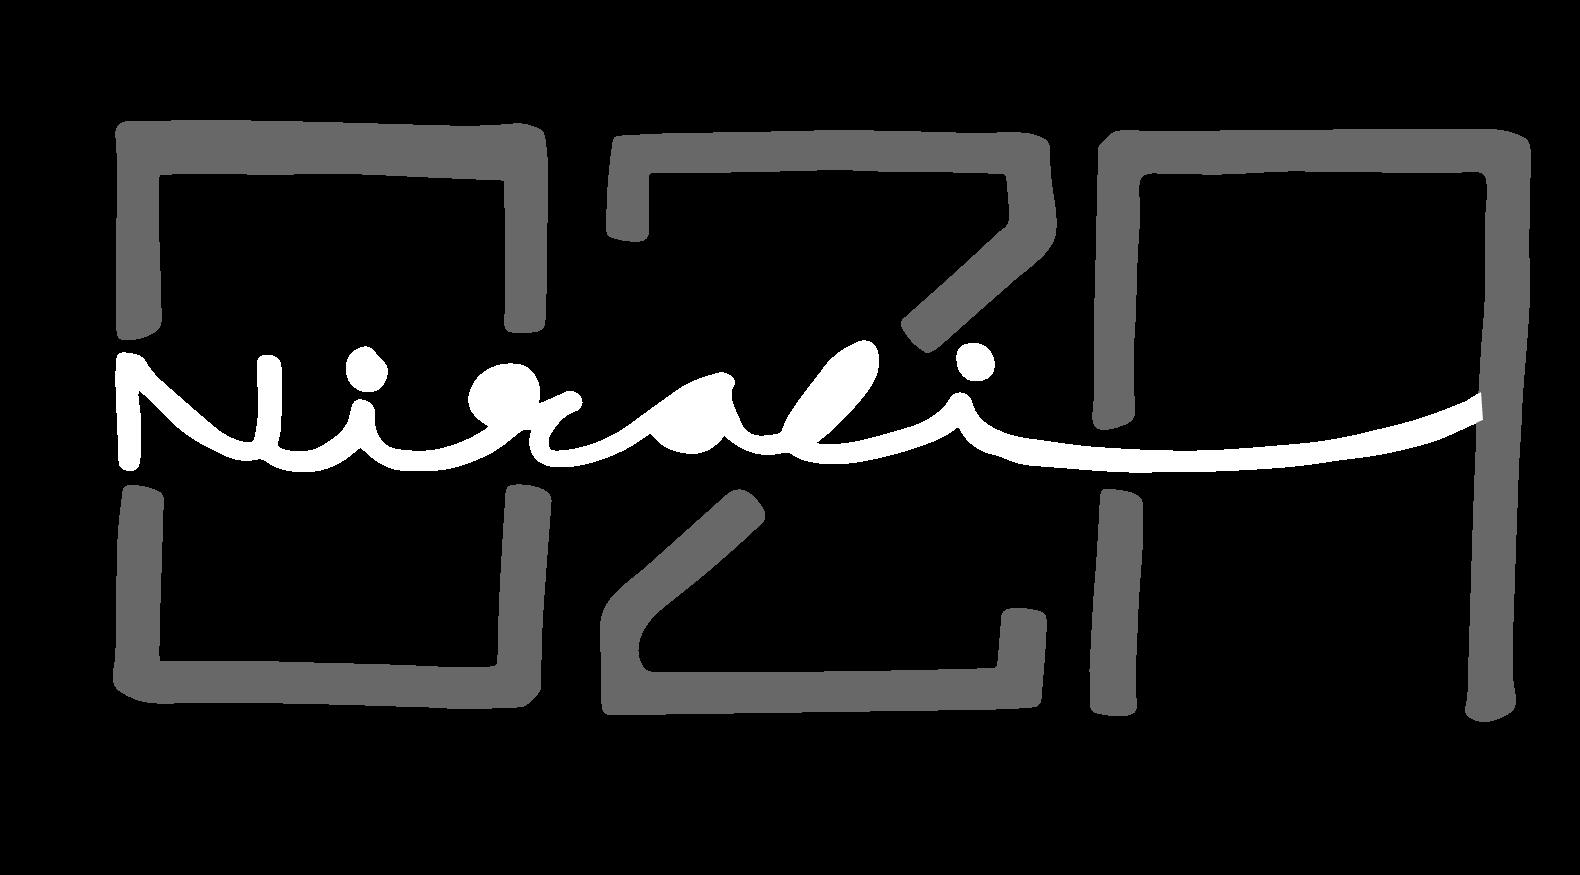 Nirali Oza